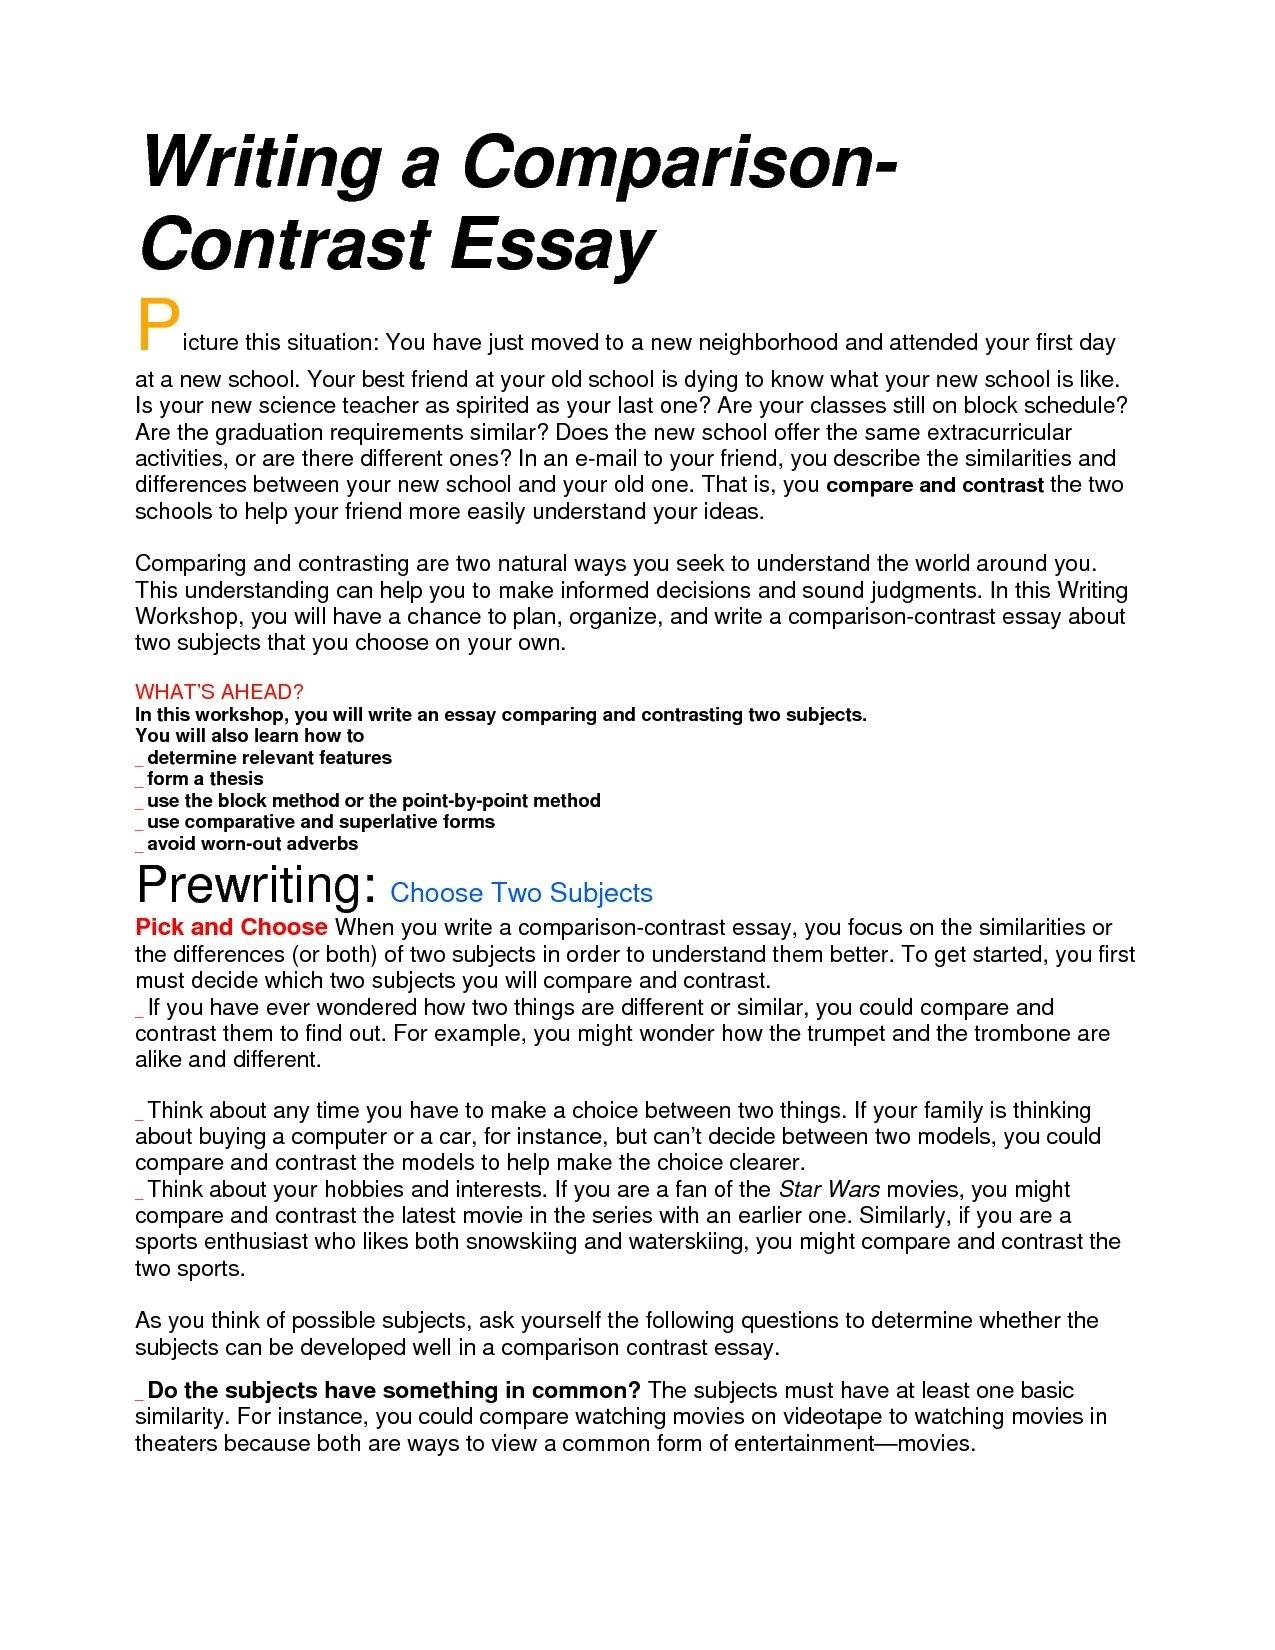 10 Unique Ideas For A Compare And Contrast Essay %name 2021